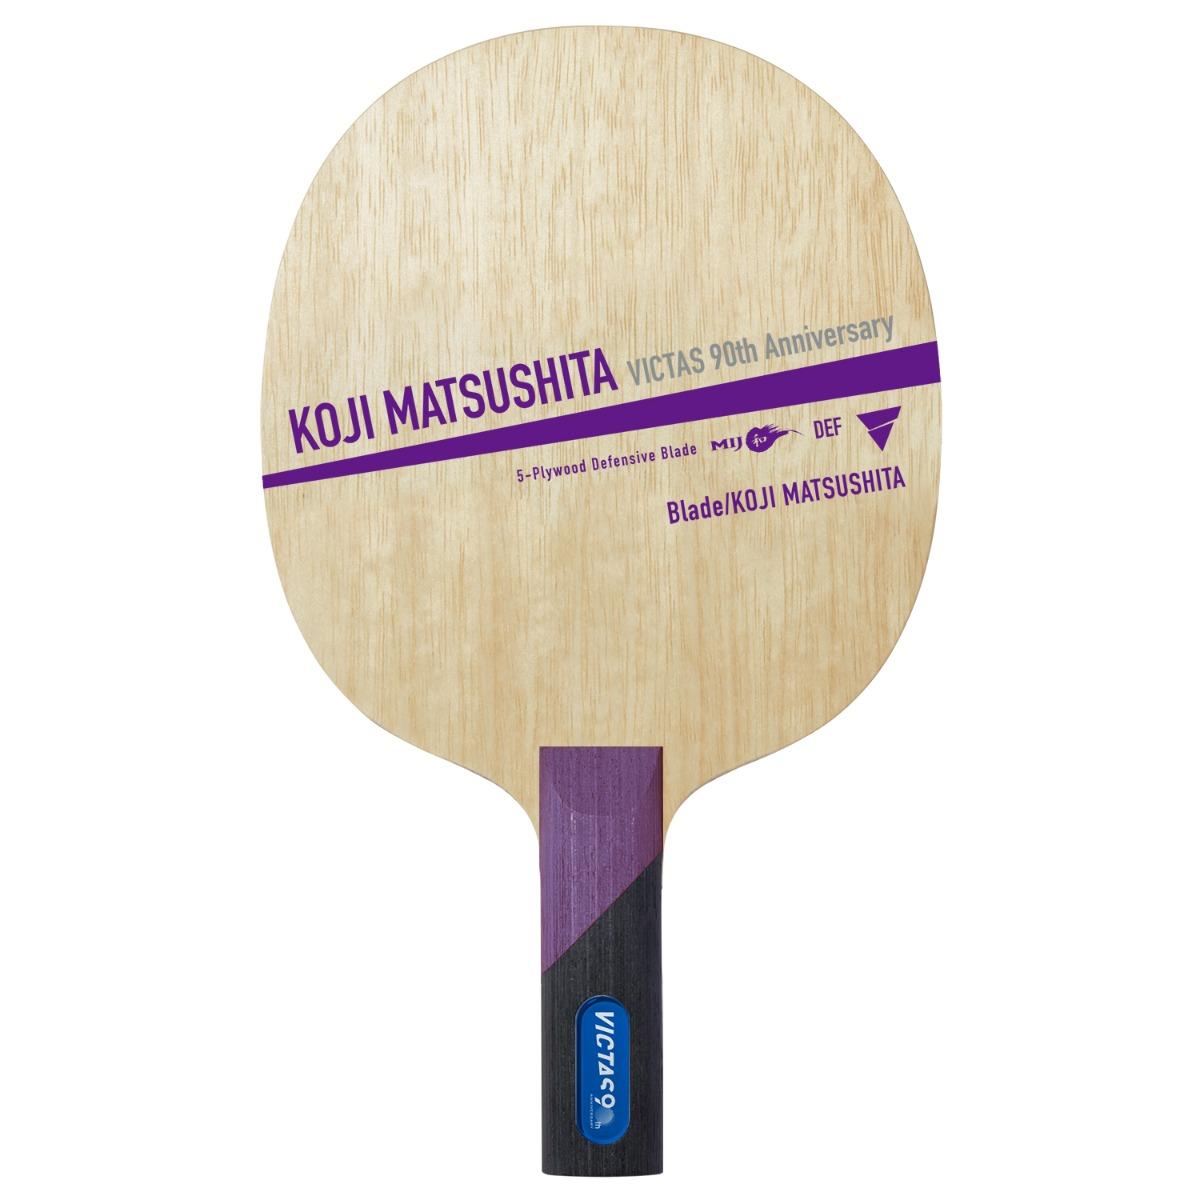 VICTAS 卓球 ラバー ラケット アパレル Rubber Racket Ball Apparel 新商品 ギア商品情報特設ページ